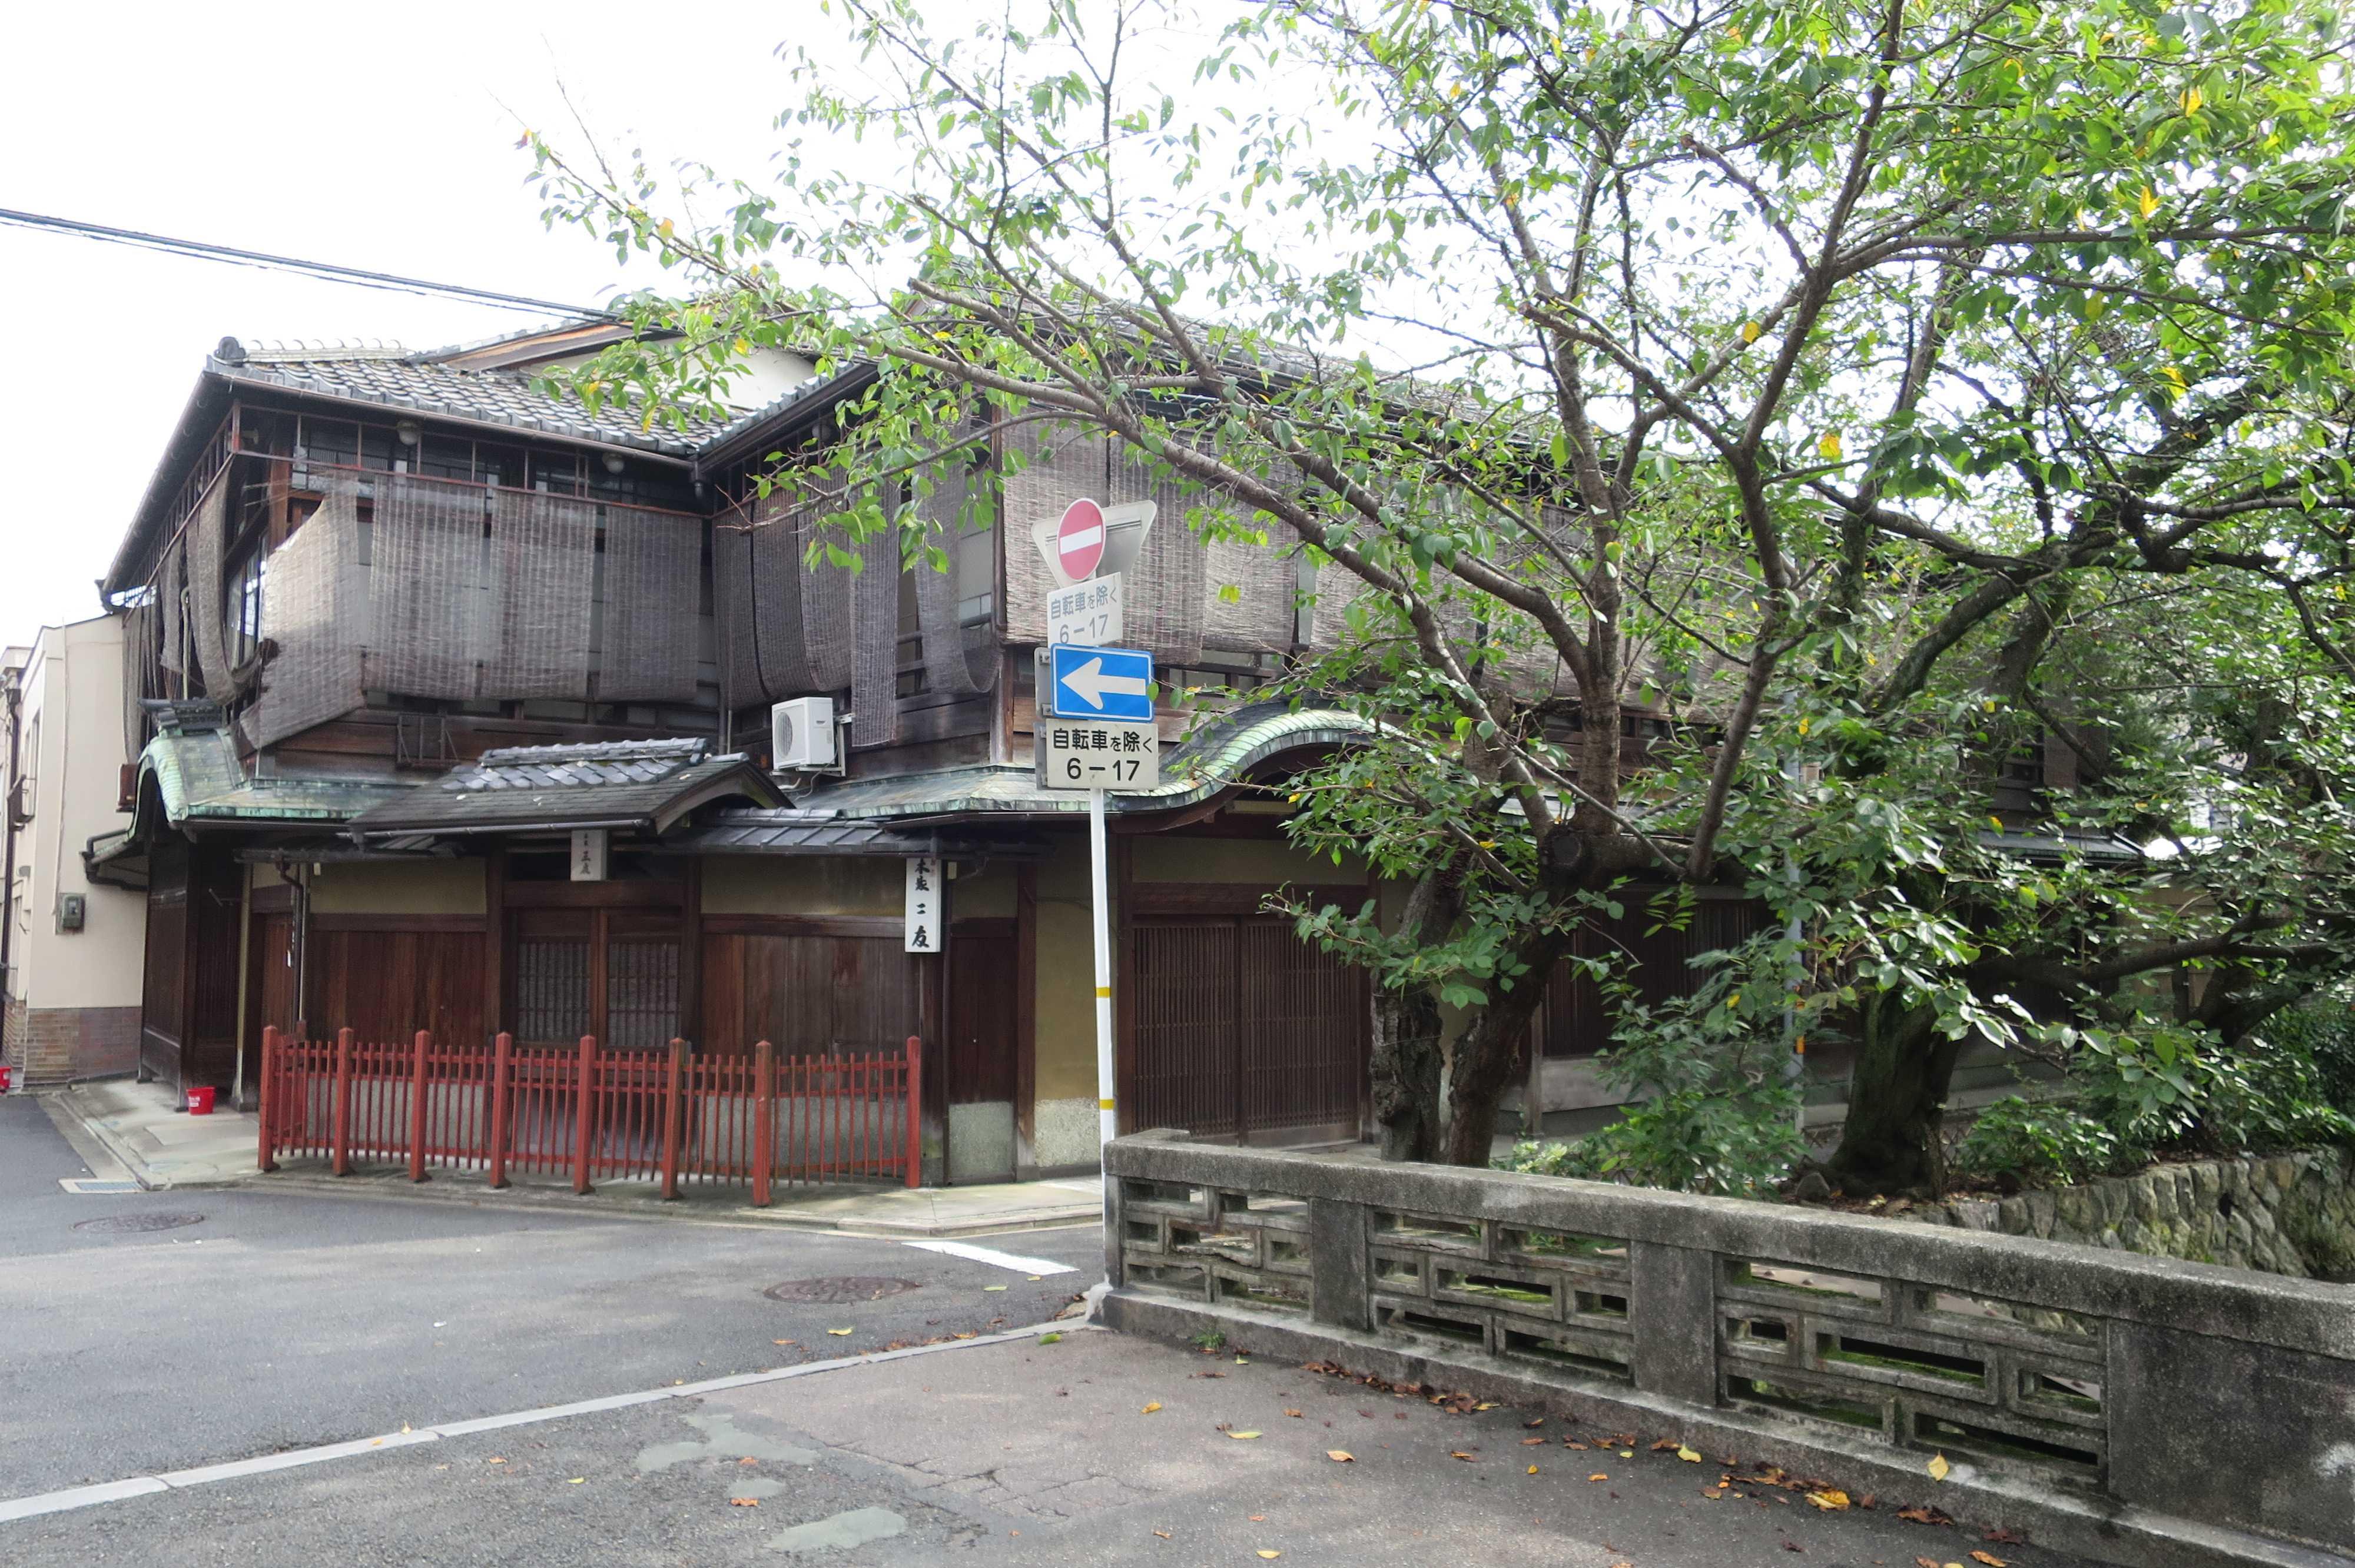 京都・五条楽園 - 本家三友 五条楽園(菊浜)地区を代表する最大の元御茶屋建築